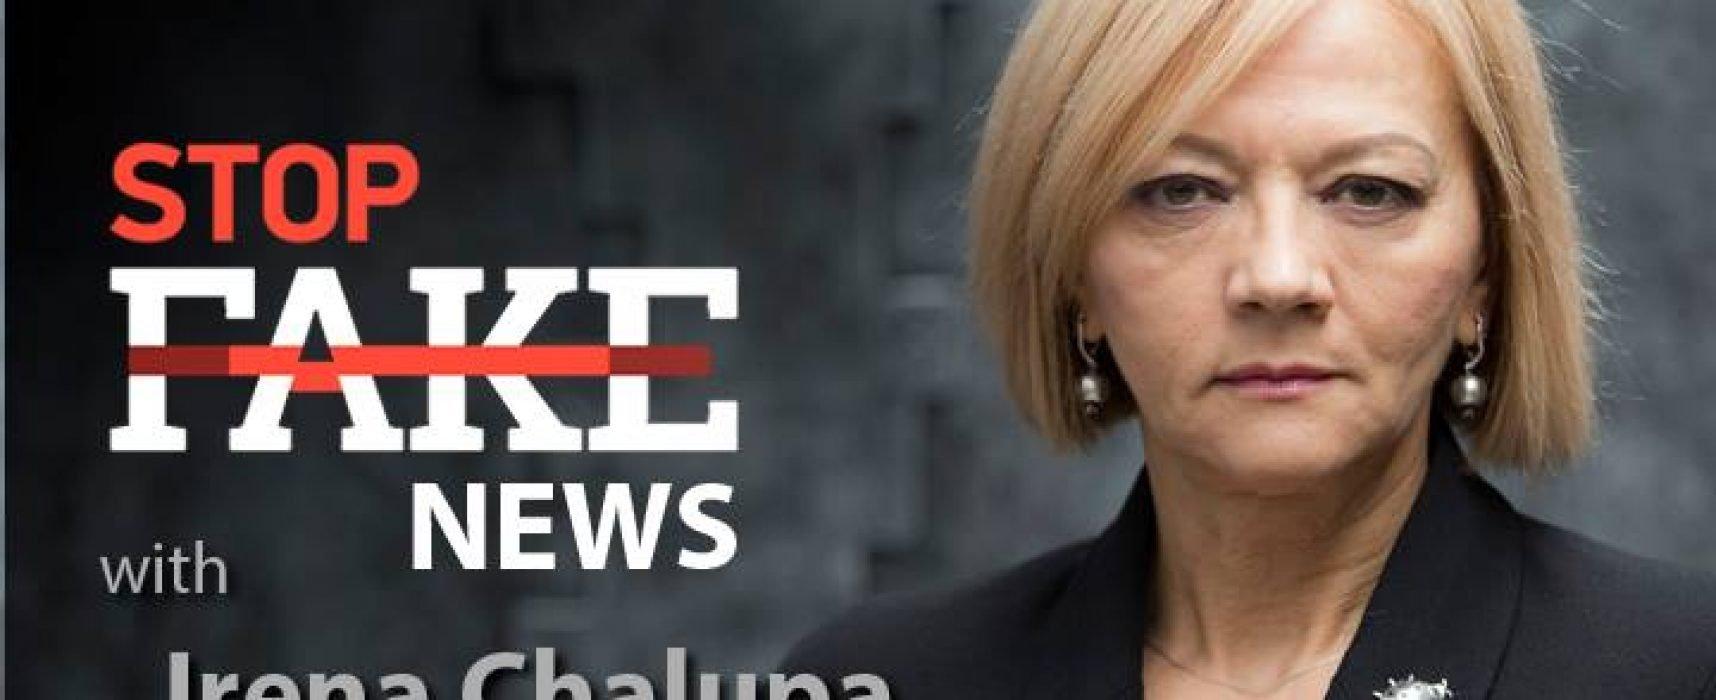 StopFakeNews #101 with Irena Chalupa